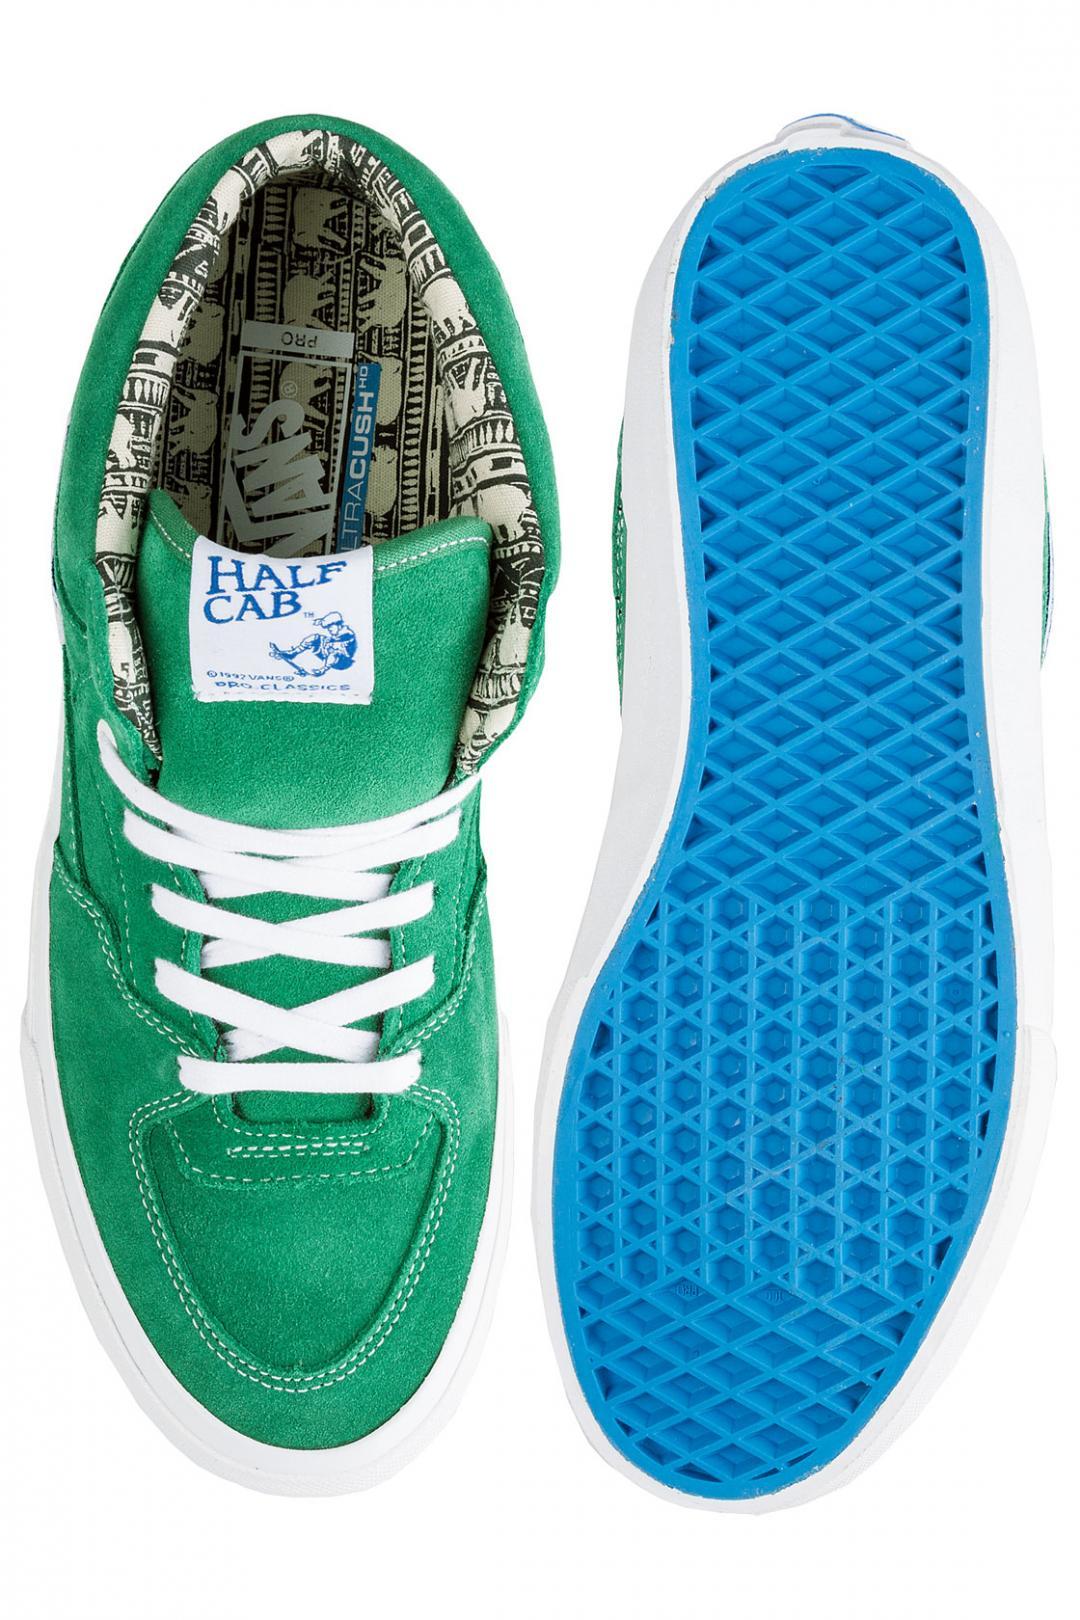 Uomo Vans x Ray Barbee Half Cab Pro og emerald   Scarpe da skate